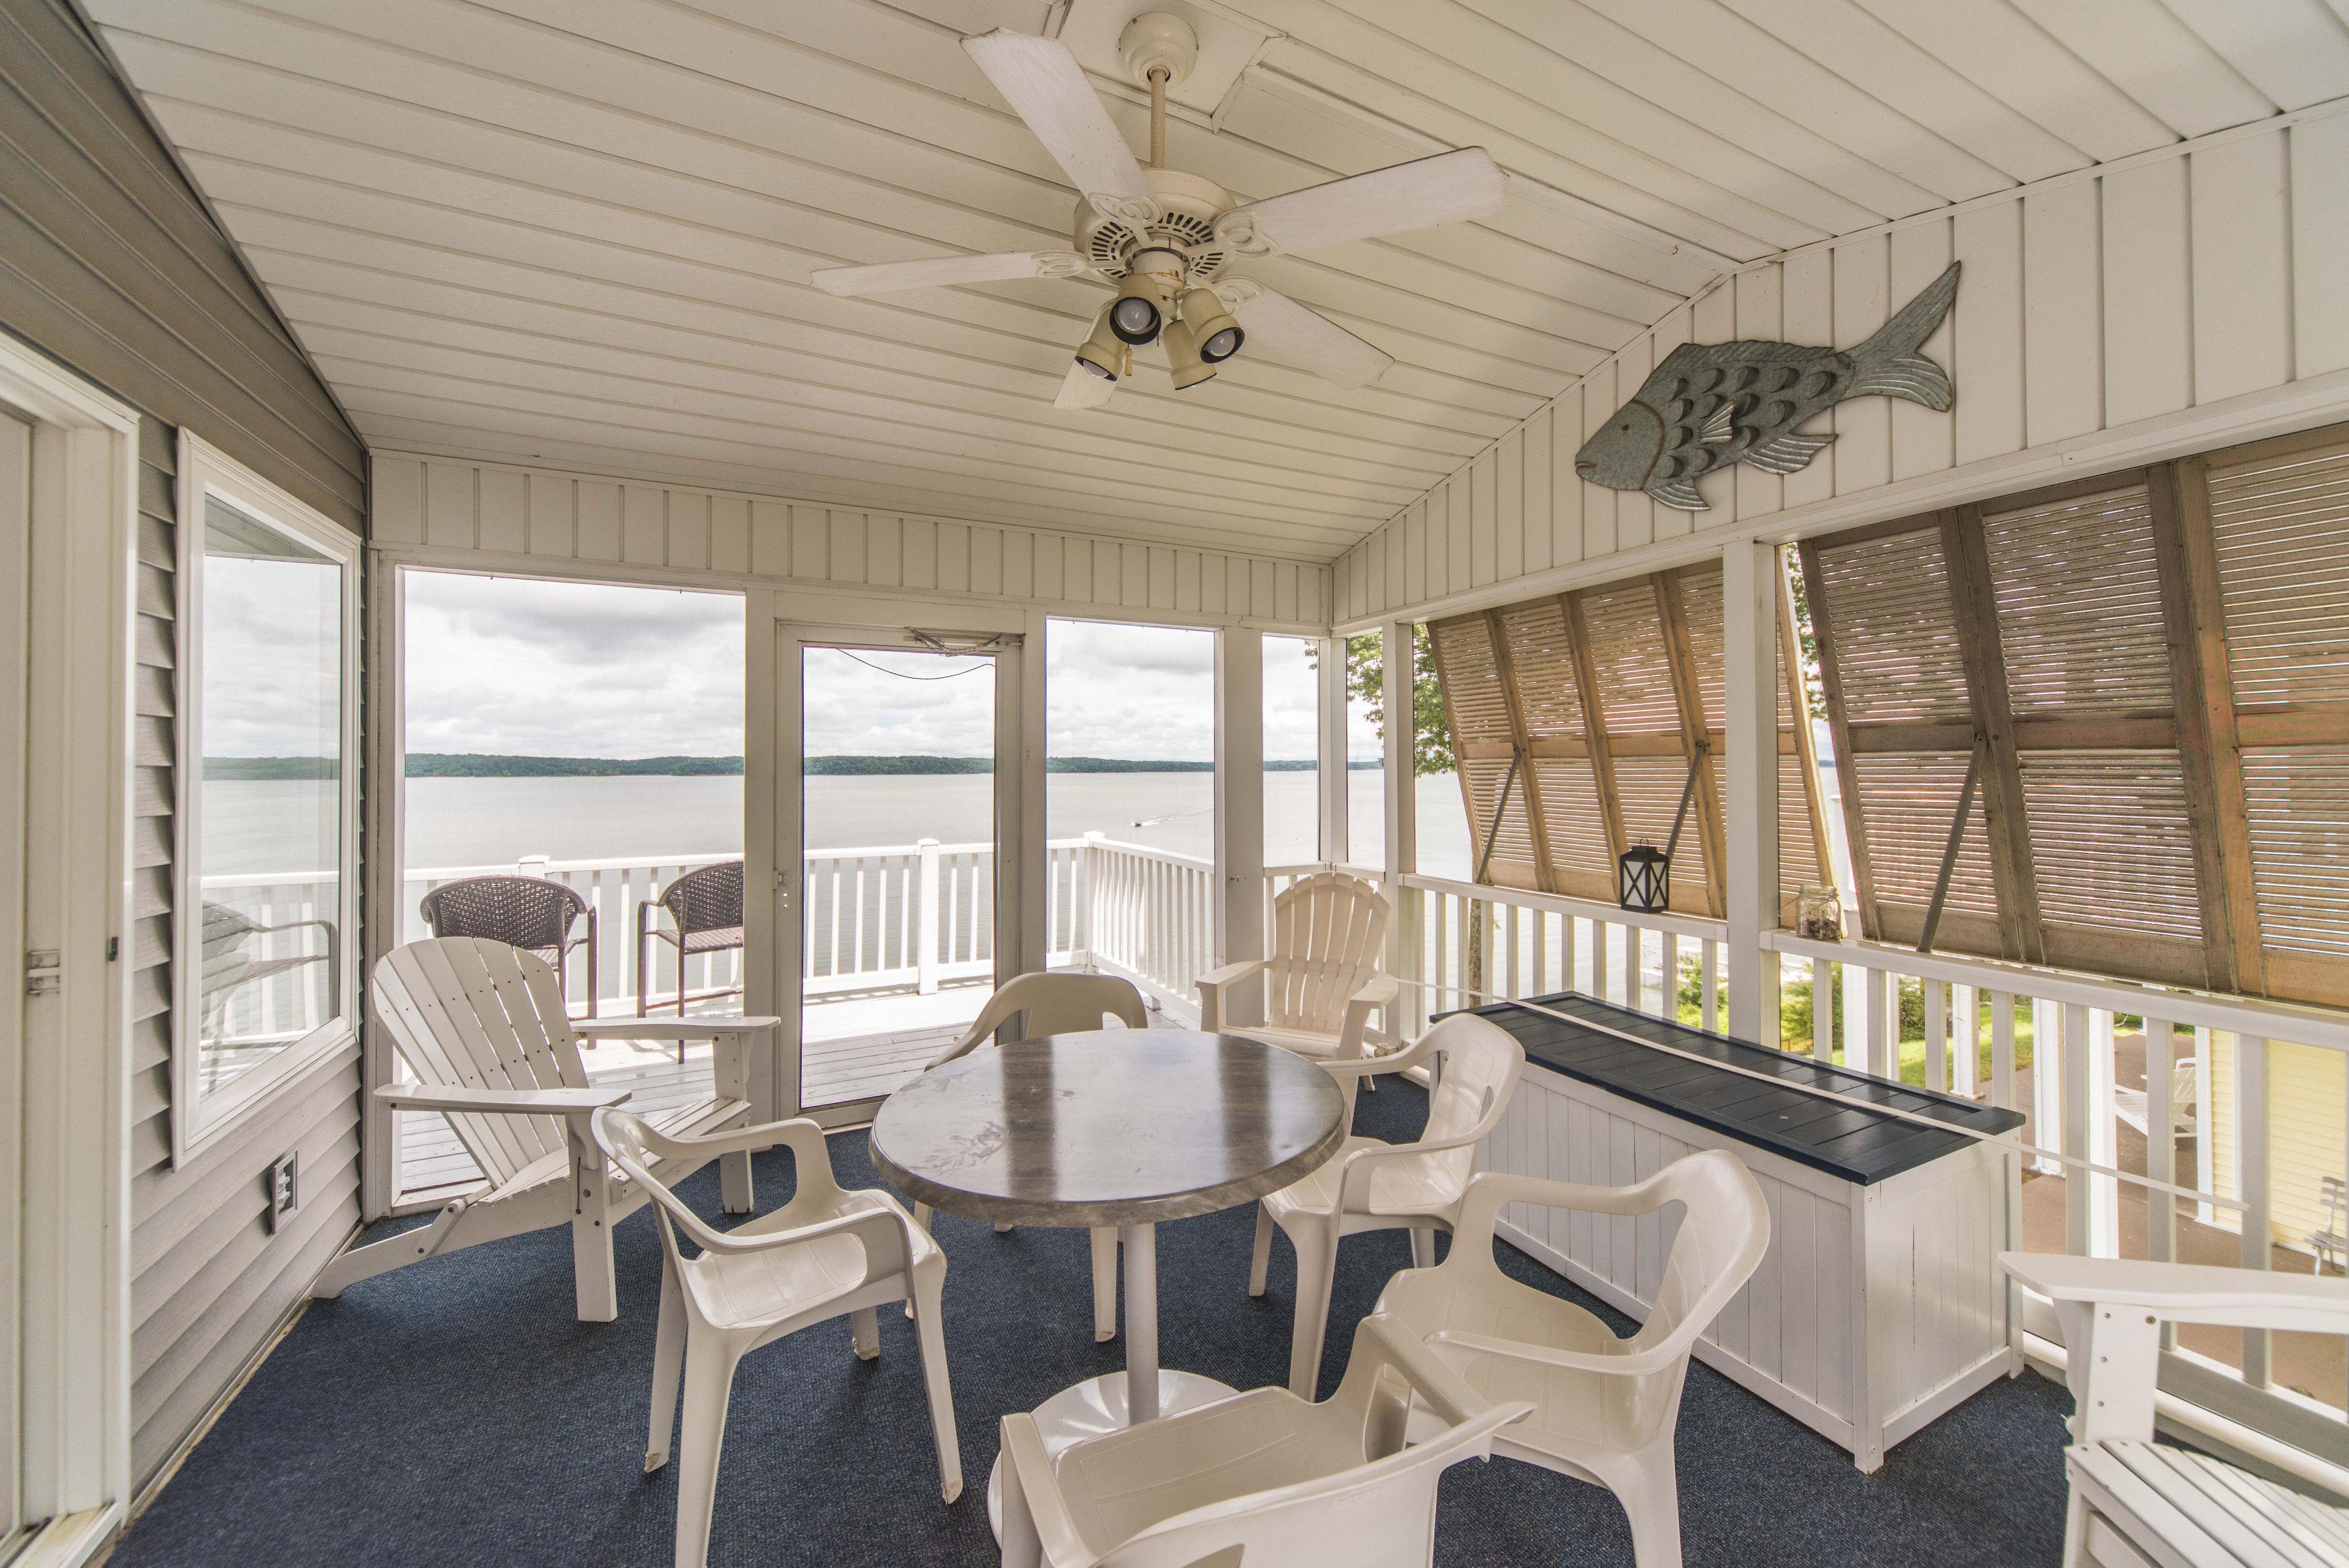 Incredible Lake Front Luxury 5Bdrm On Kentucky Lake Jz Vacation Download Free Architecture Designs Scobabritishbridgeorg